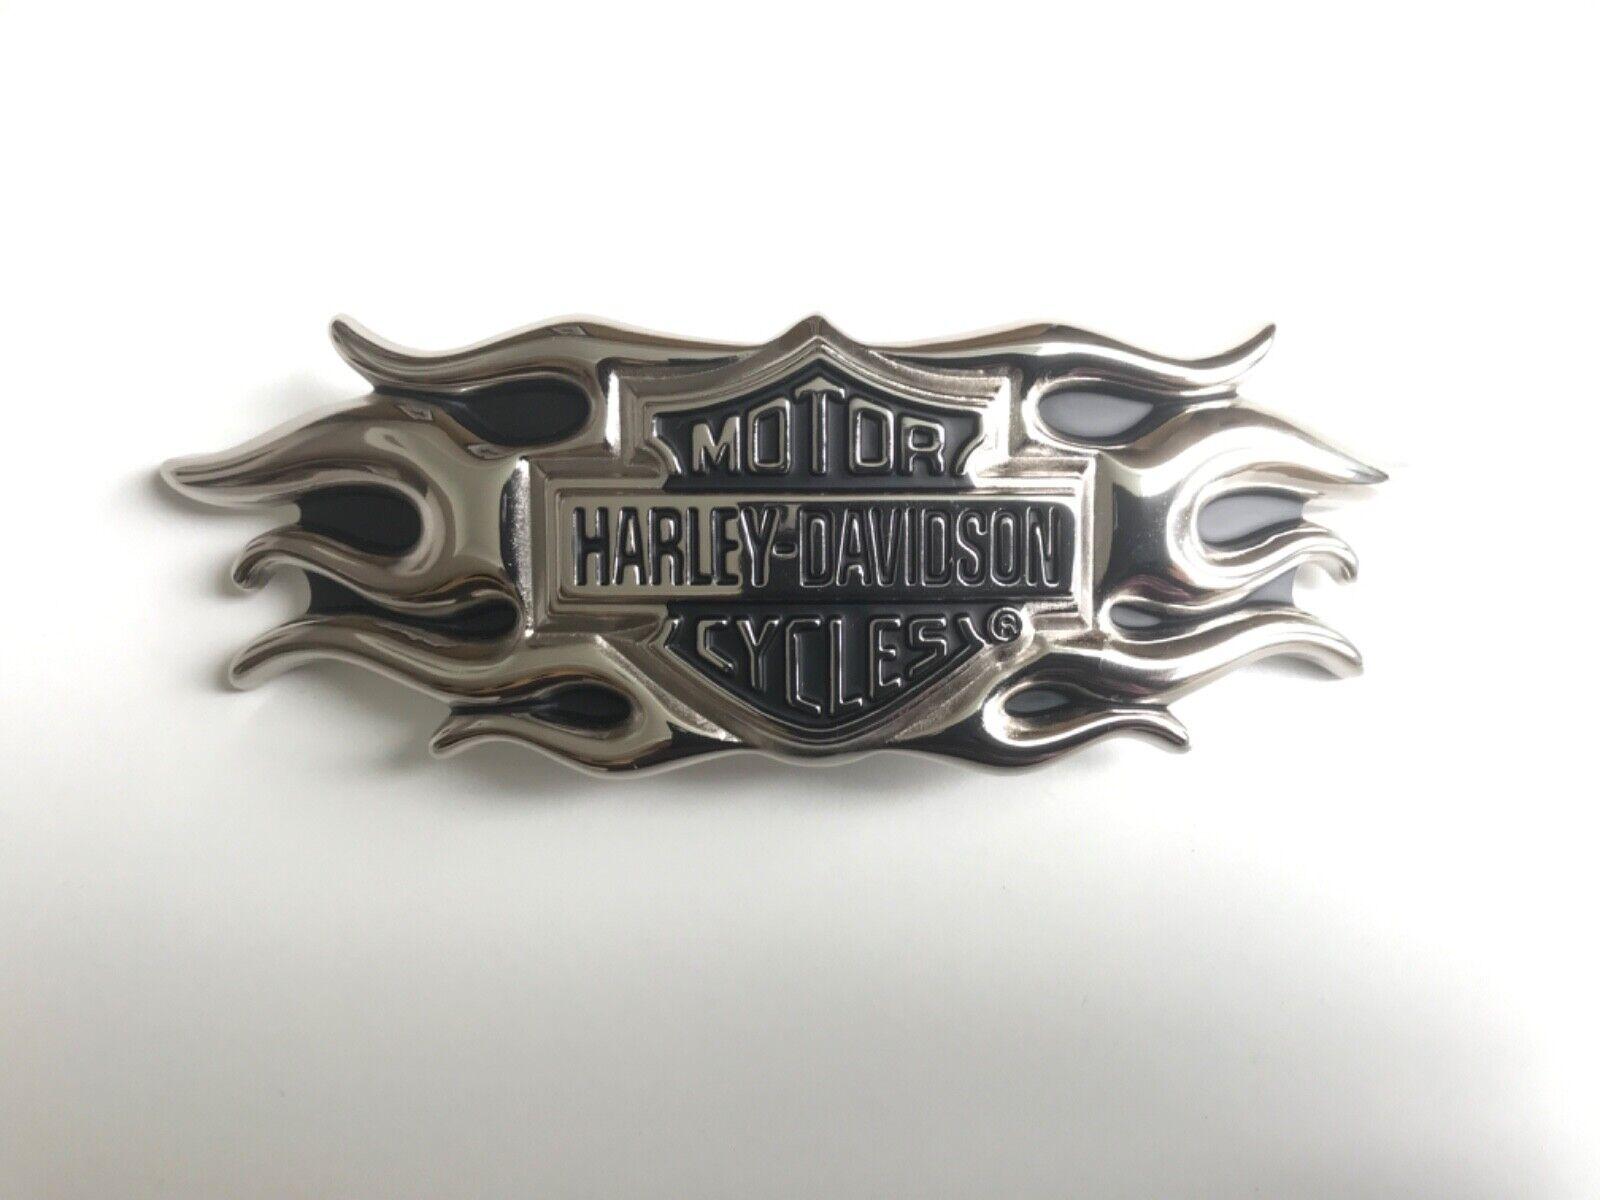 Harley-Davidson mens collectable belt buckle.#9955504V.Nickel plated B&S ,flames